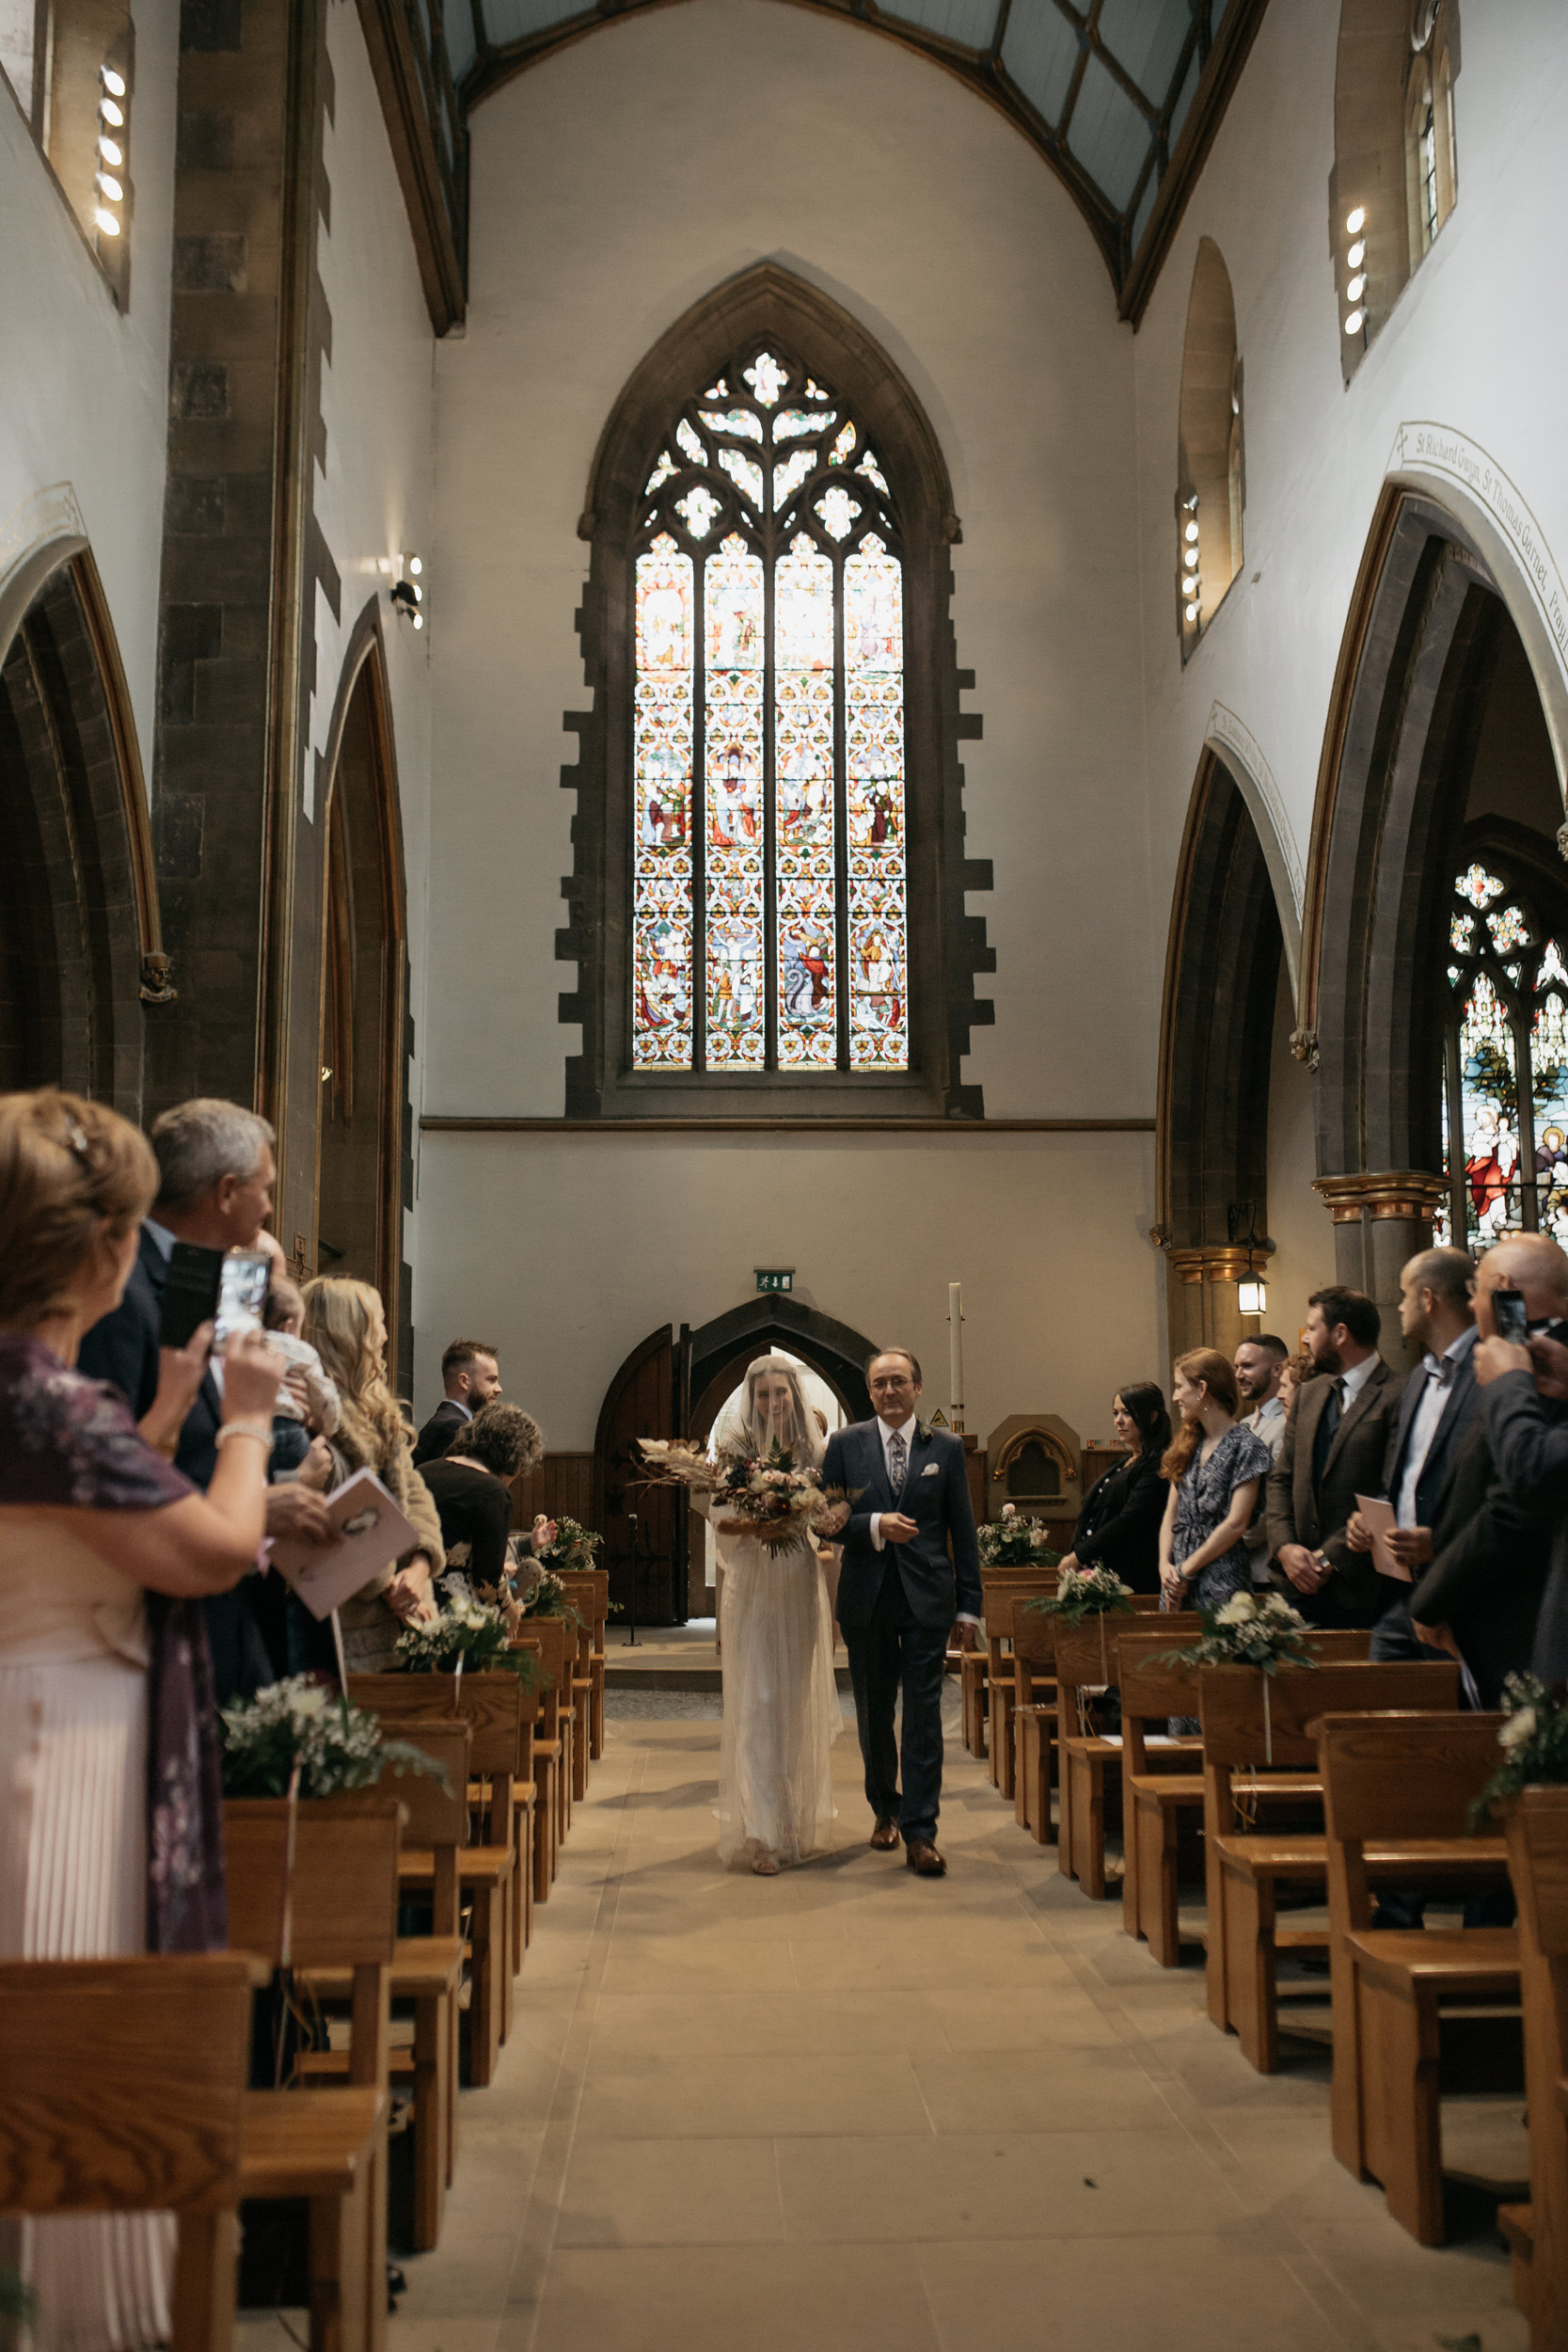 Joasia-Kate-Beaumont-Bohemian-Lace-Wedding-Dress-Peak-District-Sheffield-Wedding-6.jpg